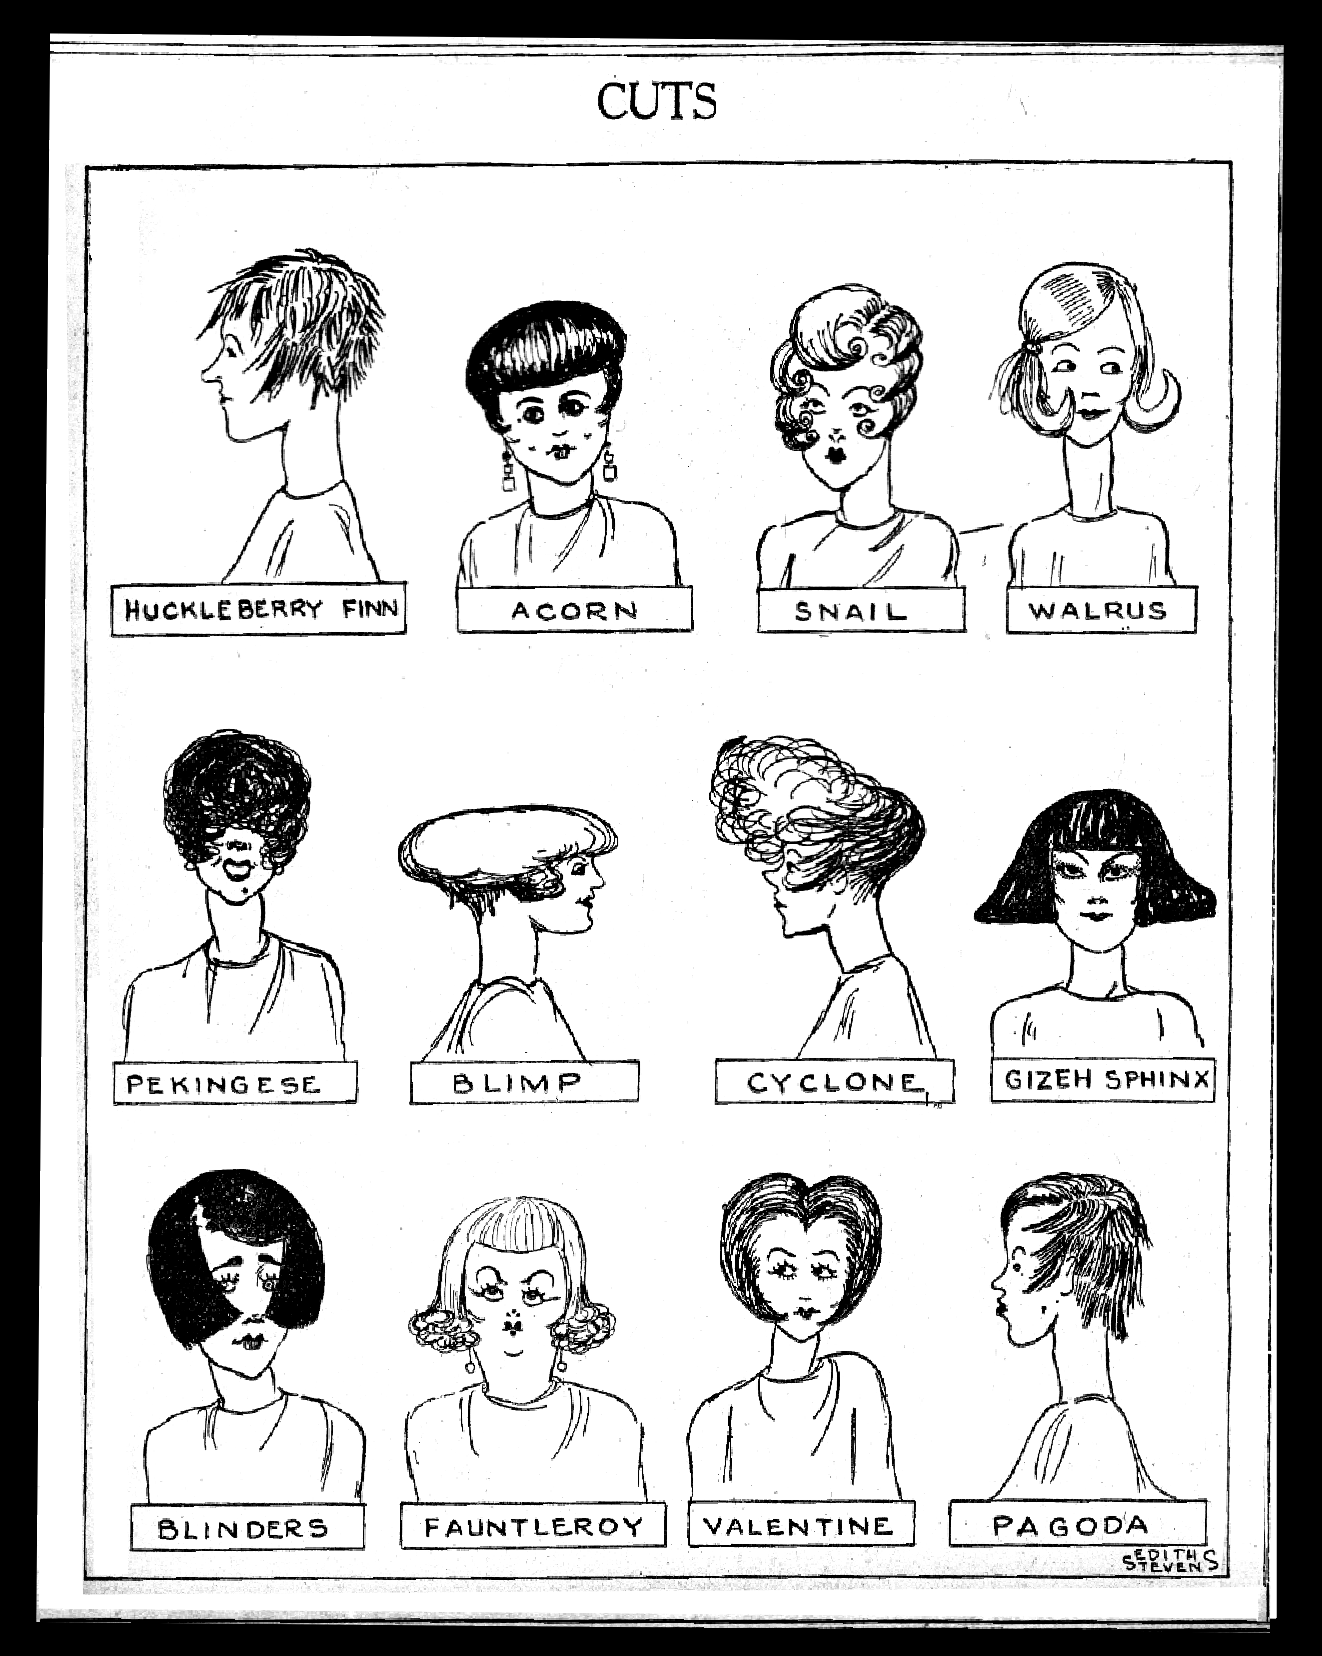 Us Girls by Edith Stevens. October 8, 1929